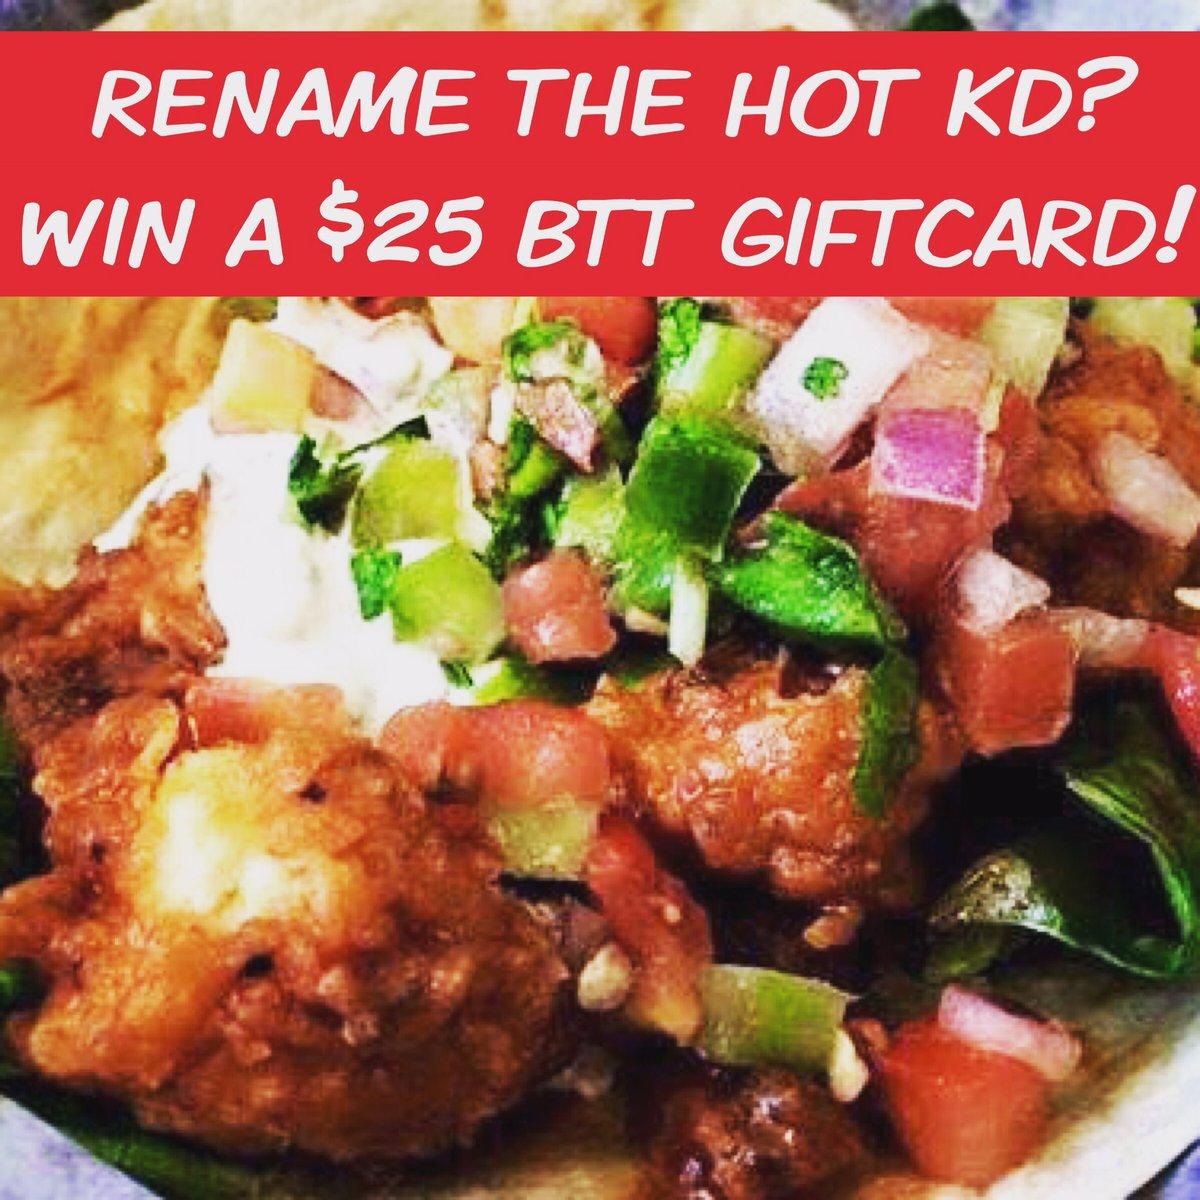 Help us rename the Hot KD! Winner gets a $25 BTT gift card! RETWEET to your friends too! #thunder #btt #uptown23rd https://t.co/yq7frN5zIA